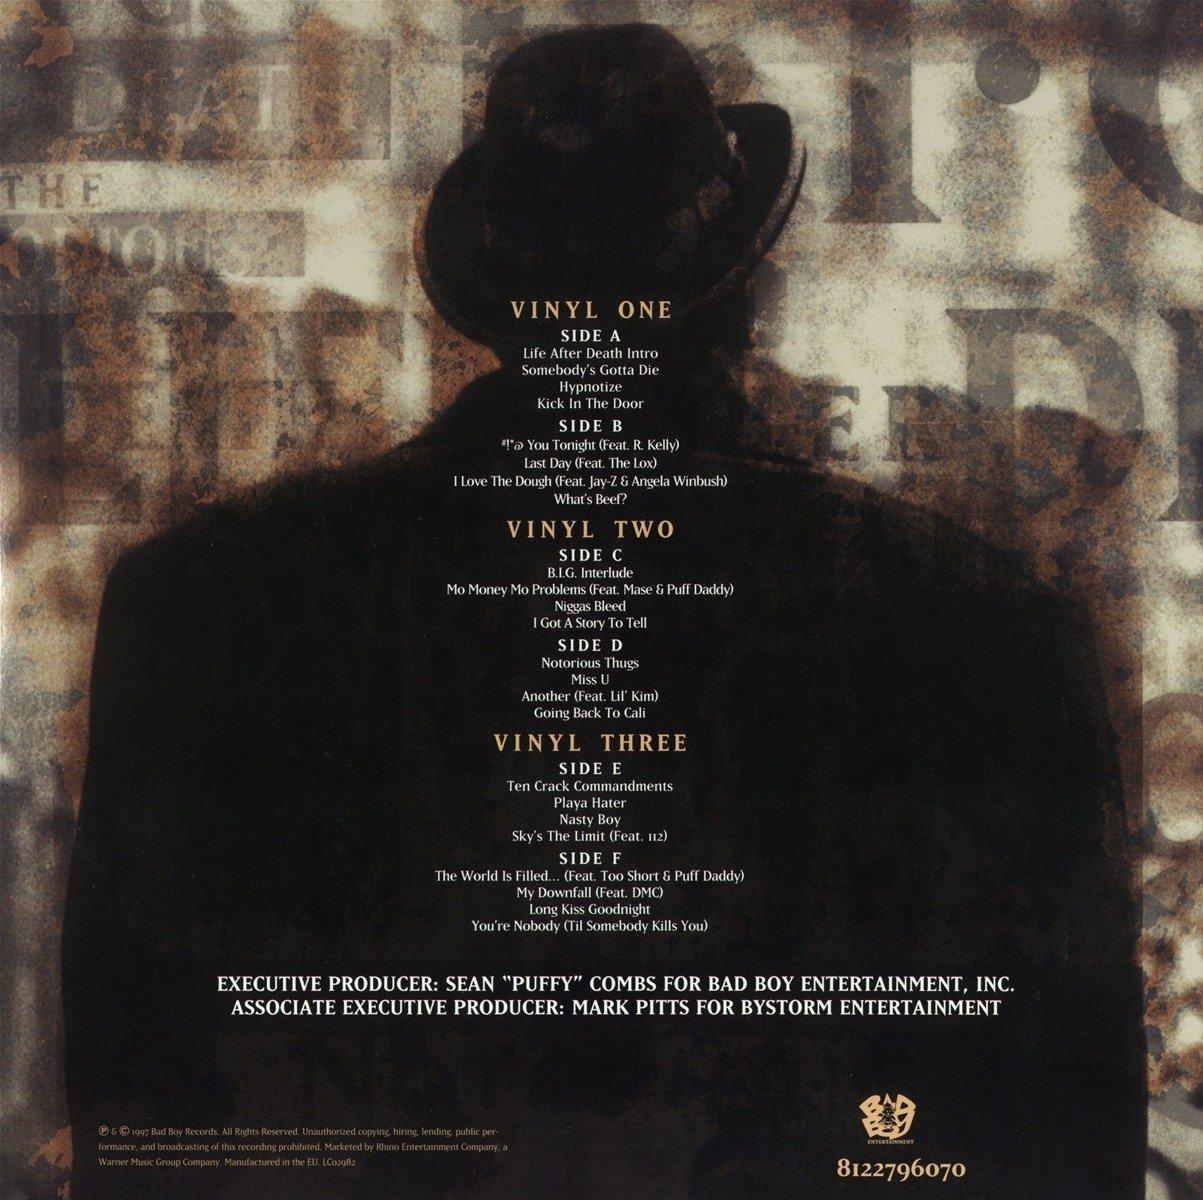 Life After Death Best 2 Songs Ablackweb Hip Hop News